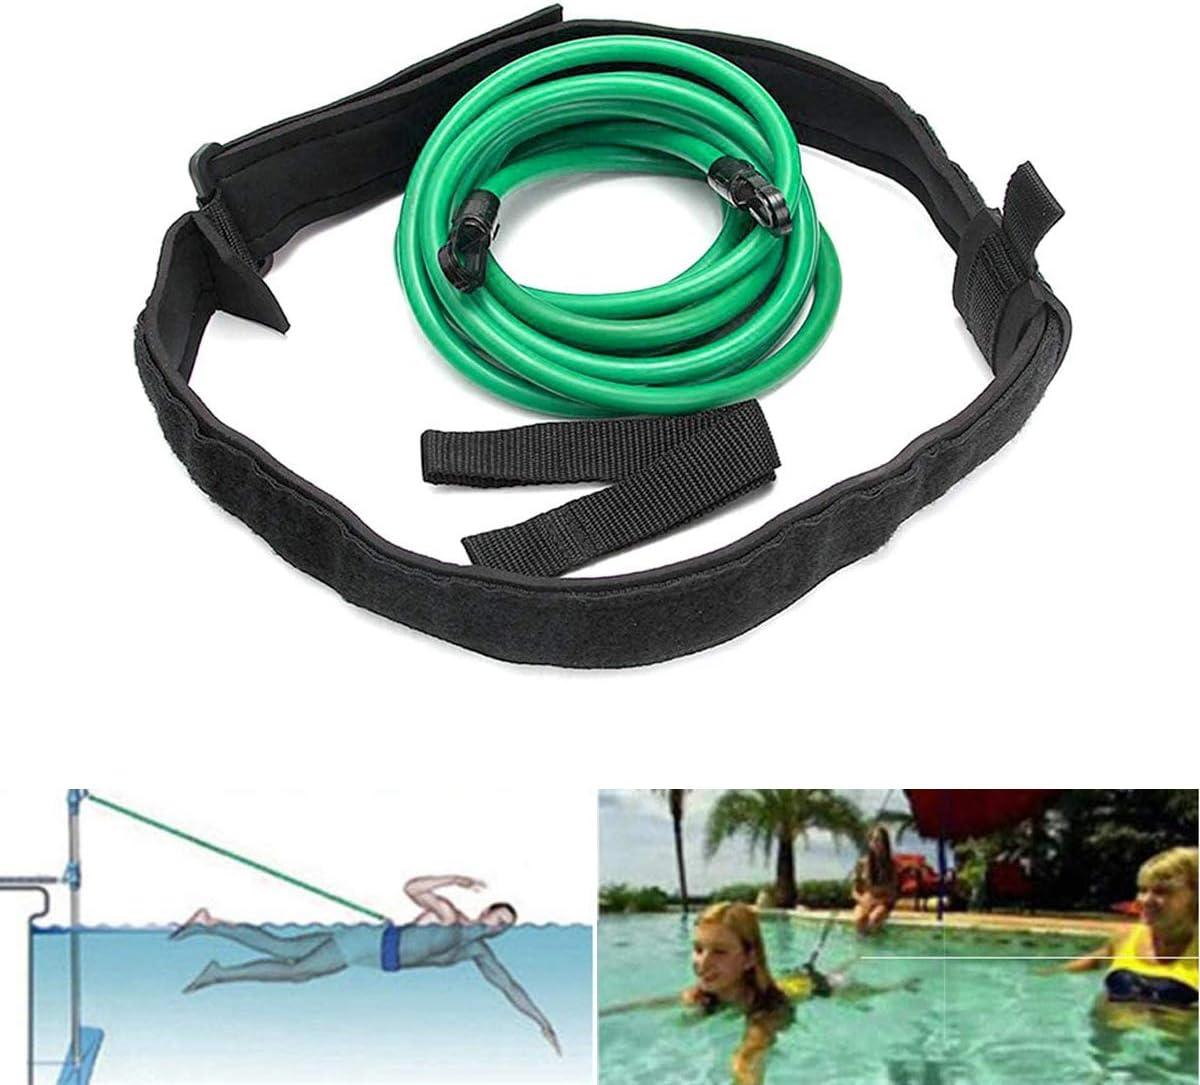 Yimeezuyu Swim Training Belts 3M Swim Bungee Cords Resistance Bands Swim Training Leash Swim Harness Static Swimming Belt